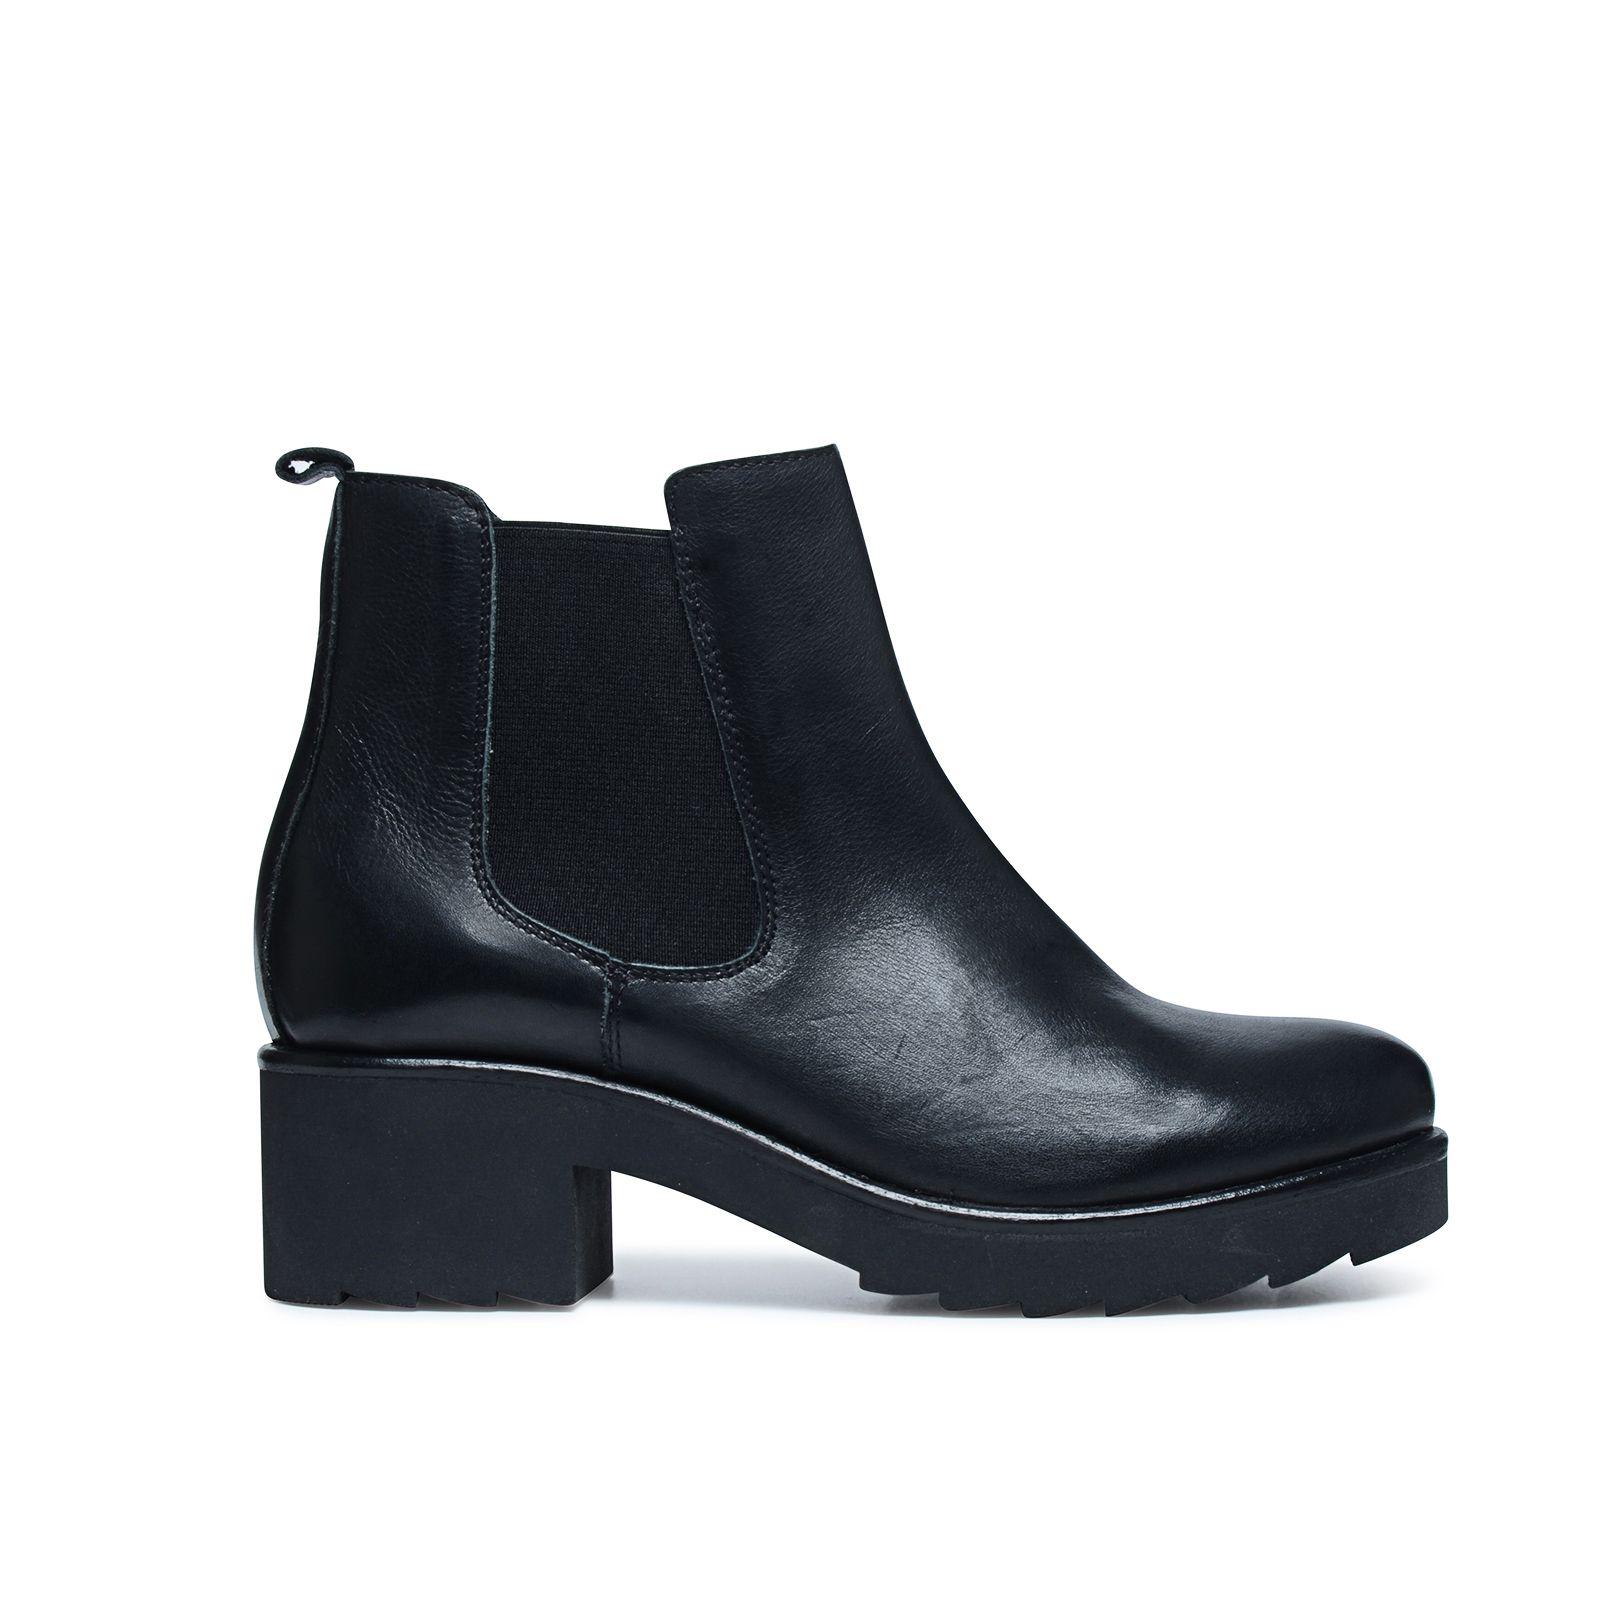 schwarze chelsea boots mit plateausohle. Black Bedroom Furniture Sets. Home Design Ideas